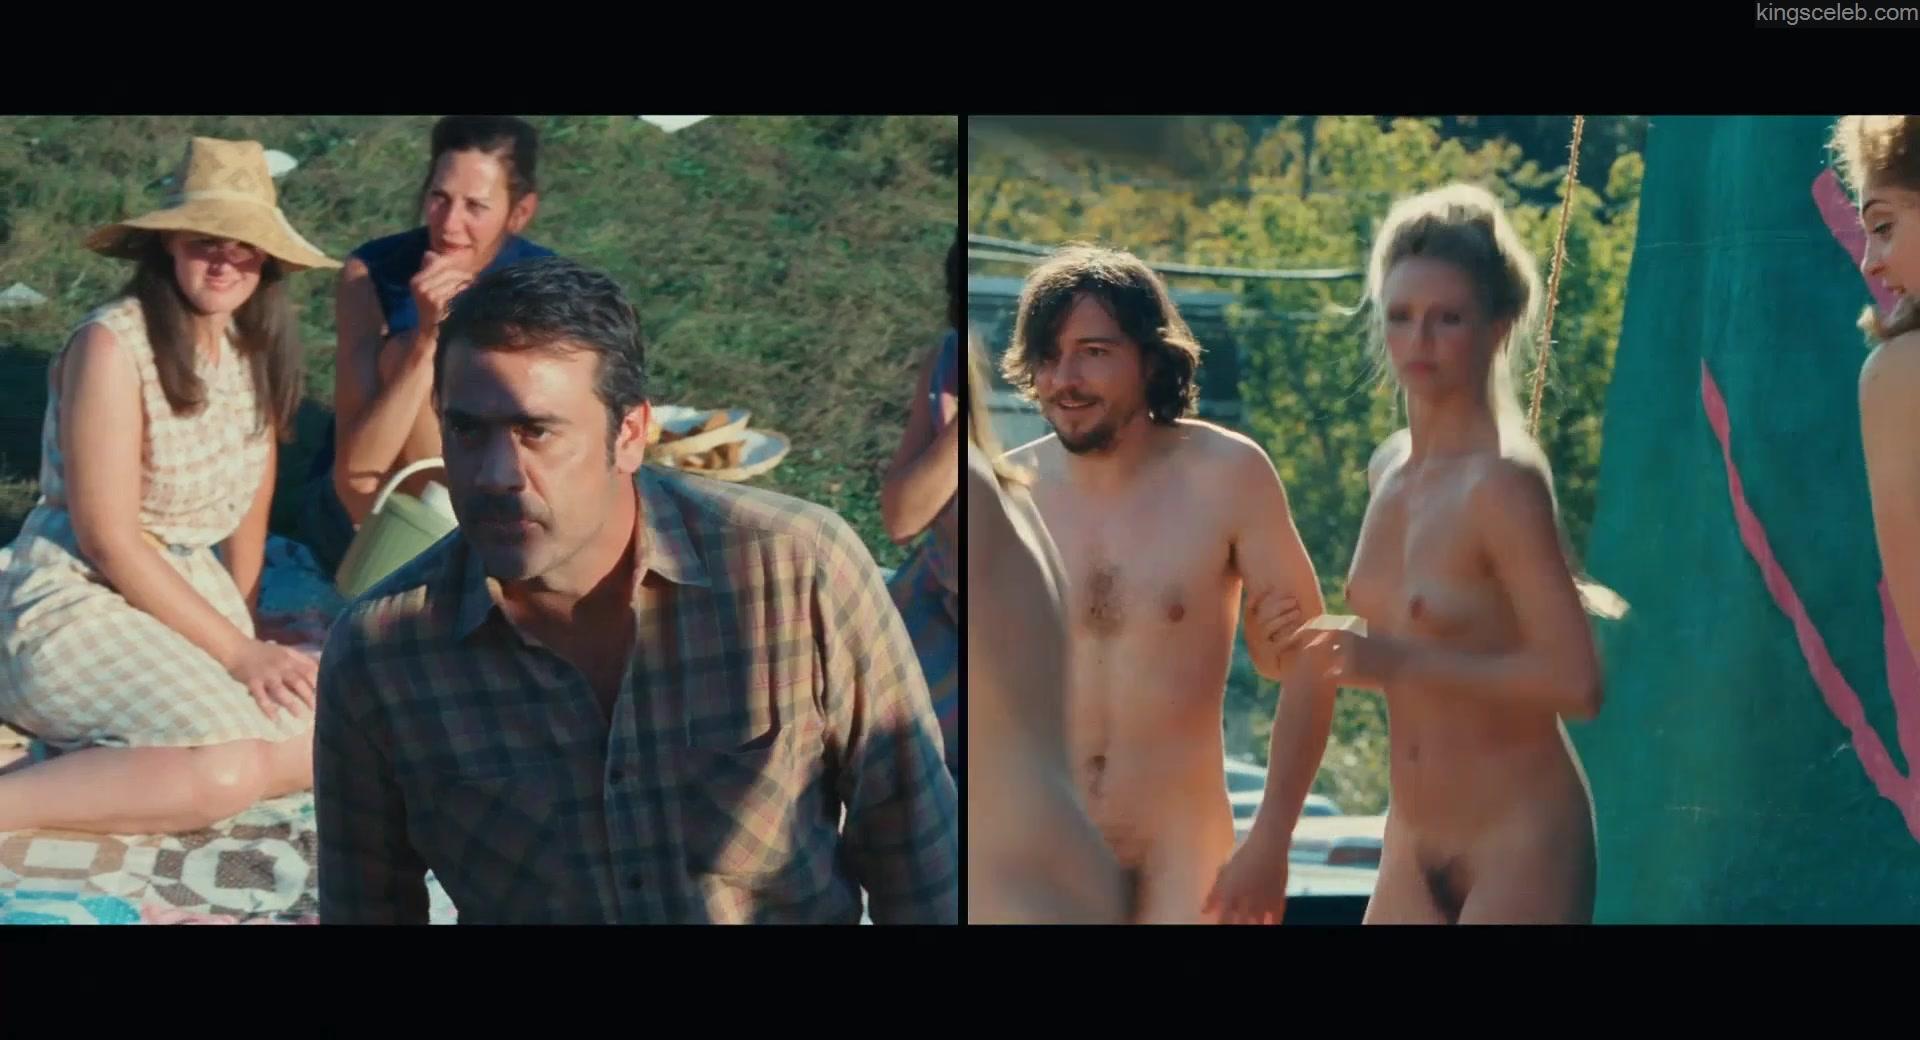 Stars Kelli Garner Nude Pictures Photos